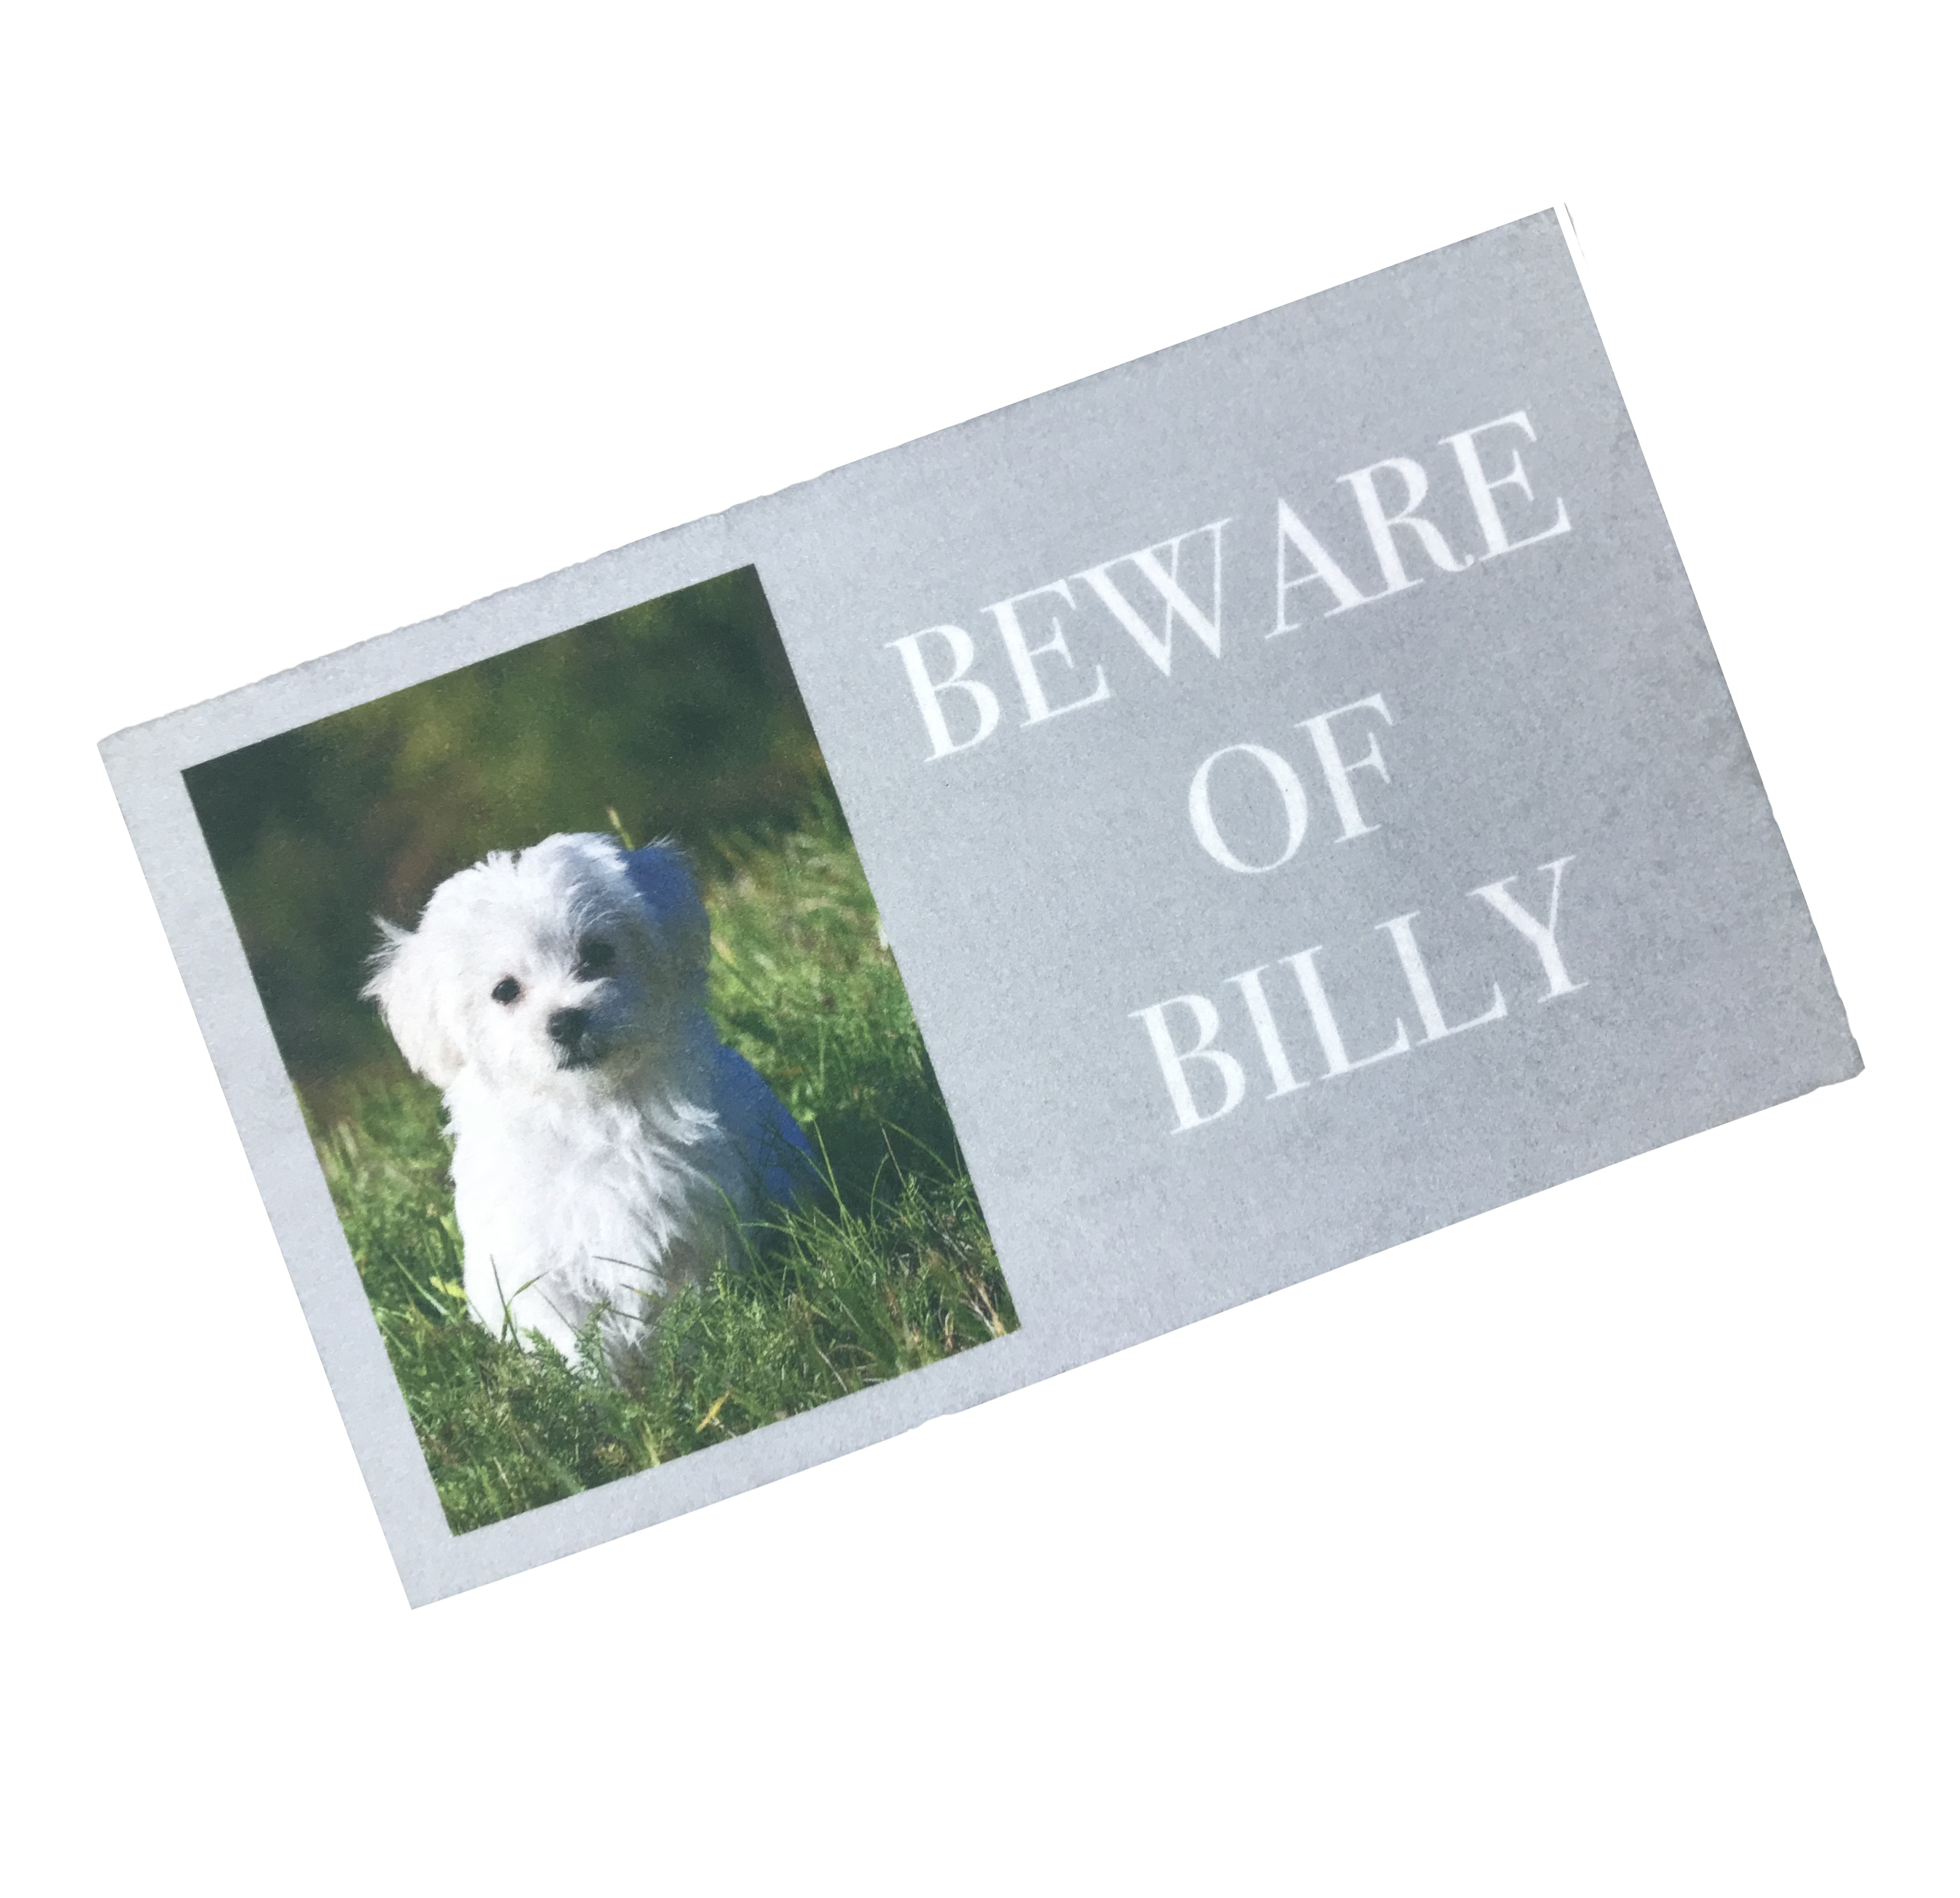 Beware Of Personalised Photo Door Mat